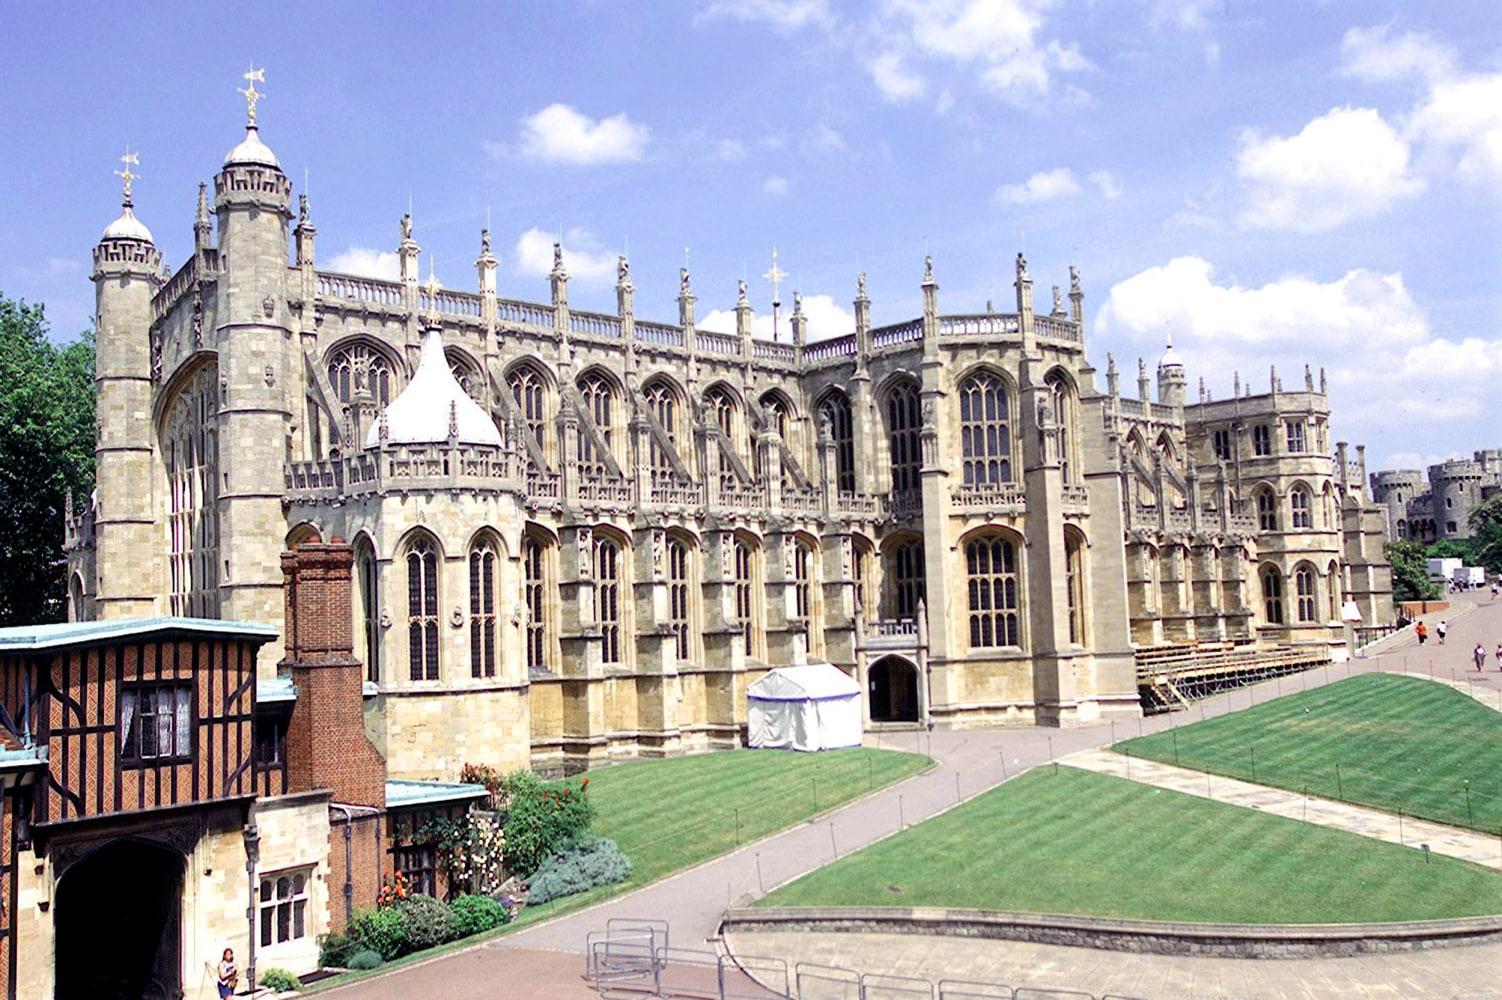 Windsor castle s